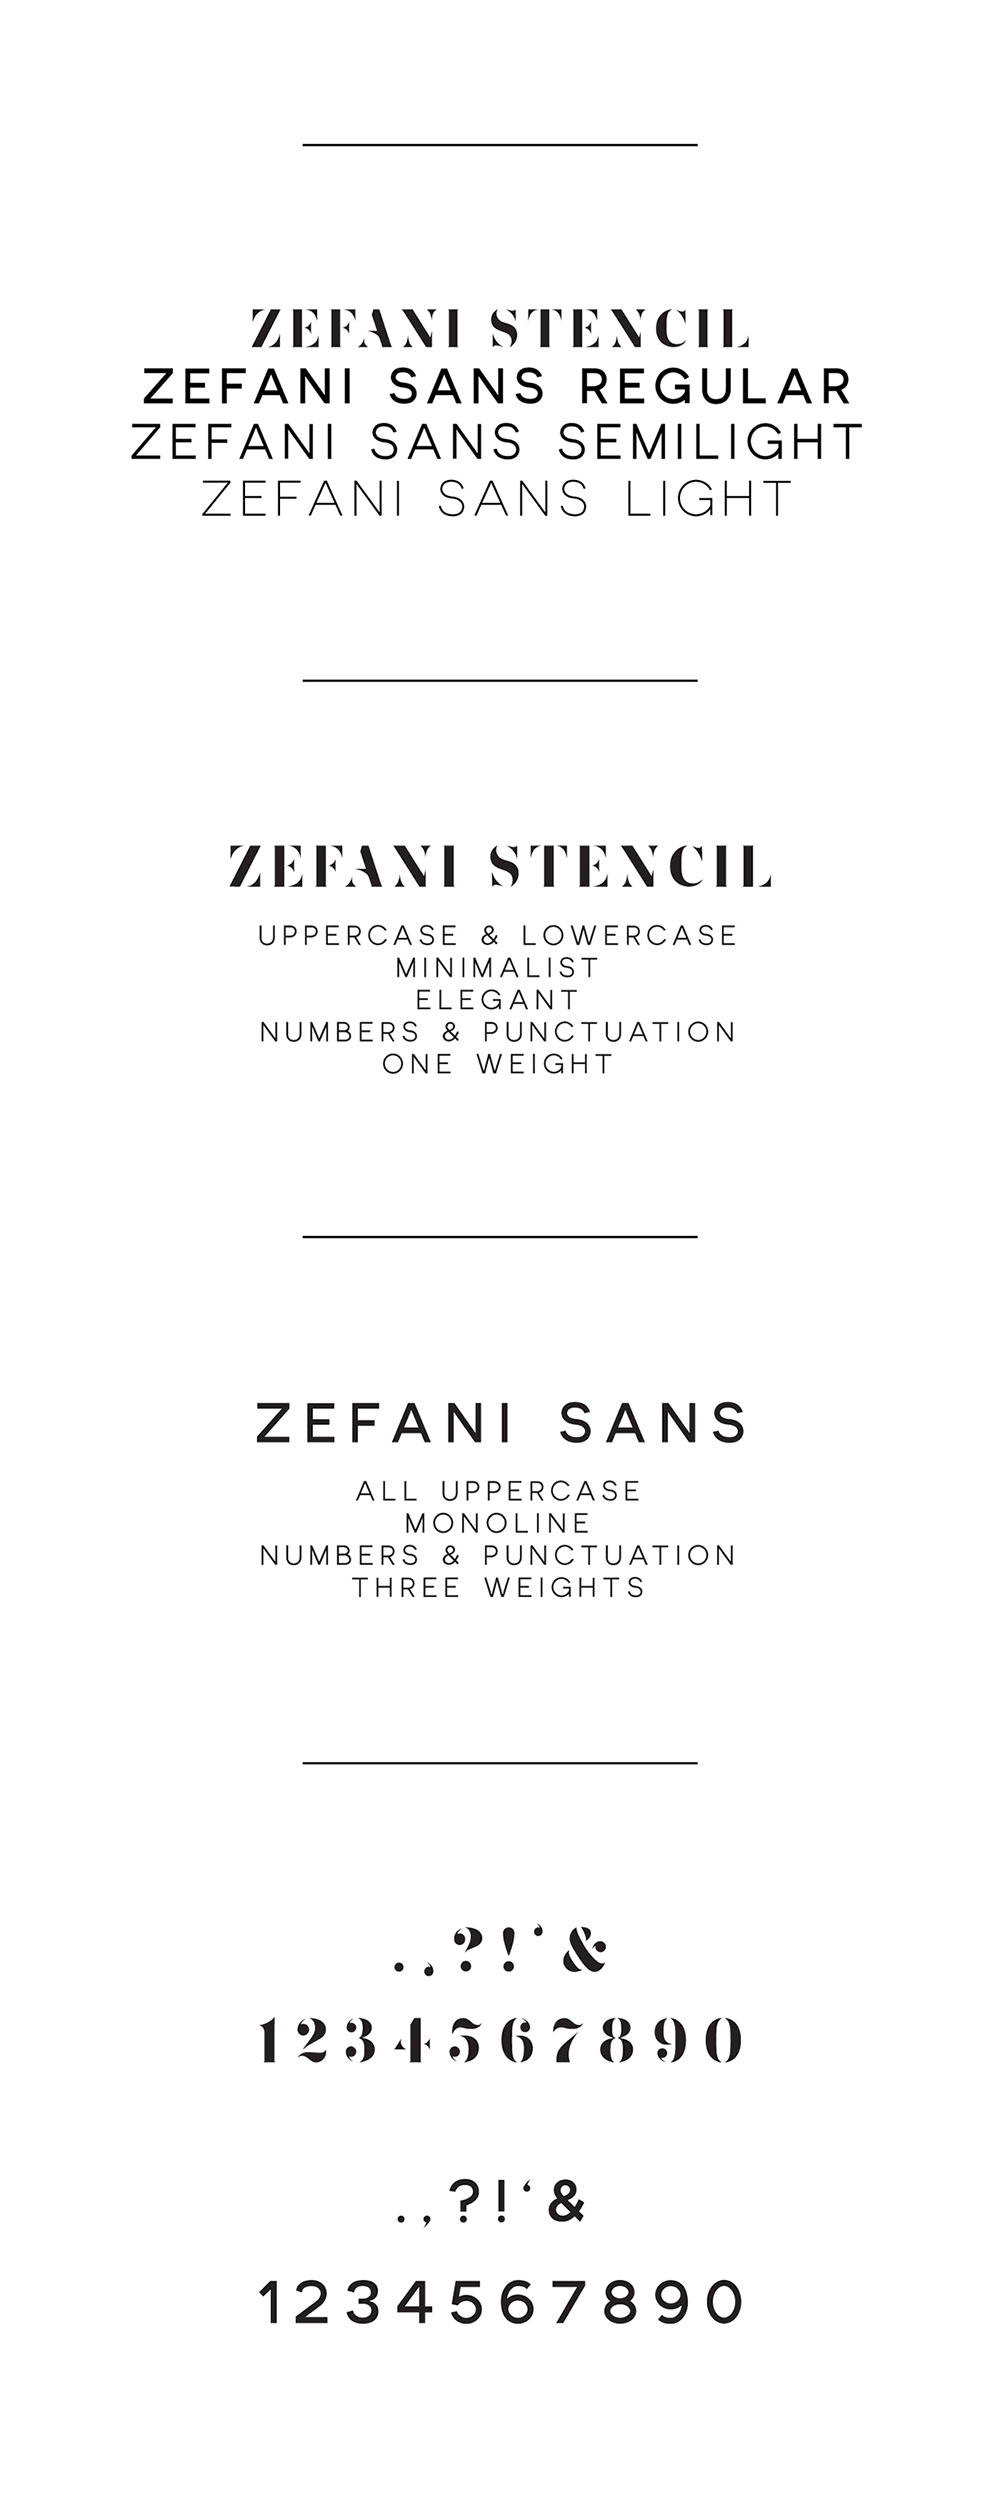 Zefani Free Type Family - An elegant free typeface